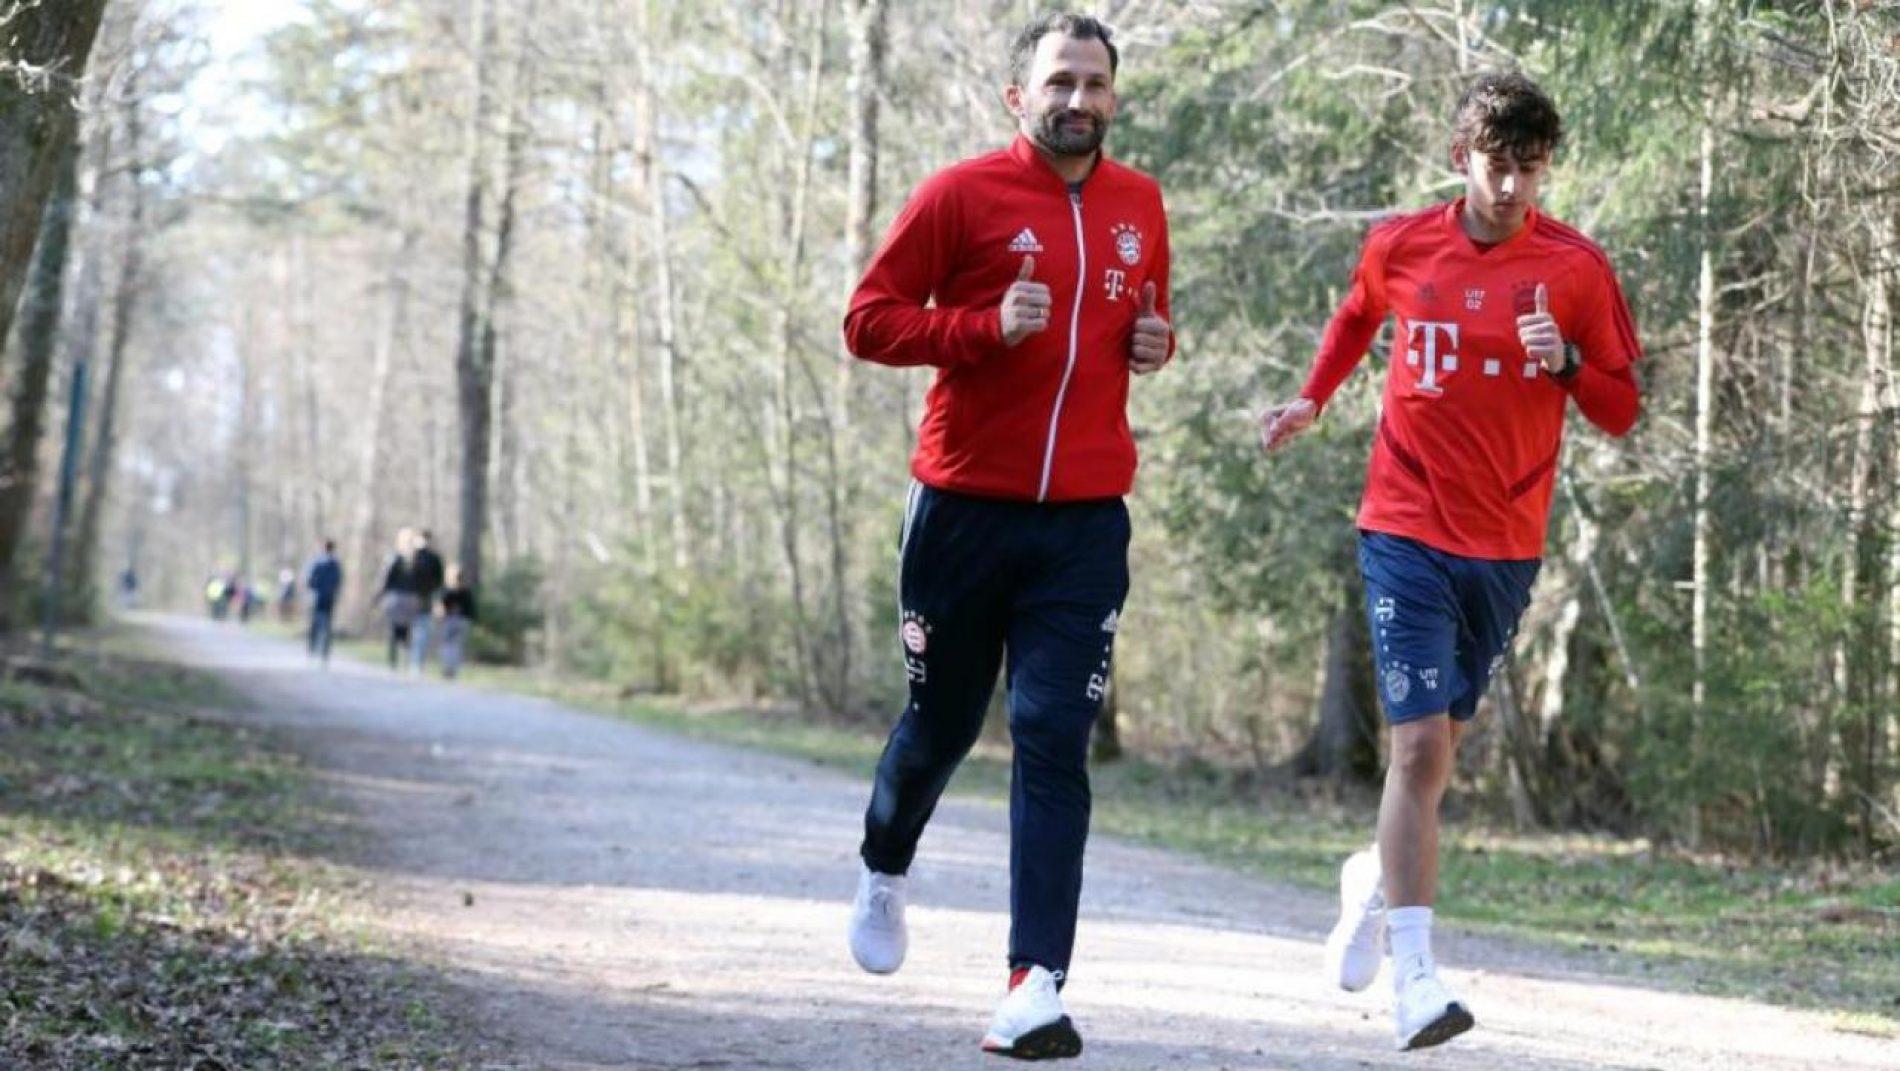 Hoće li sin Hasana Salihamidžića zaigrati za Bosnu?